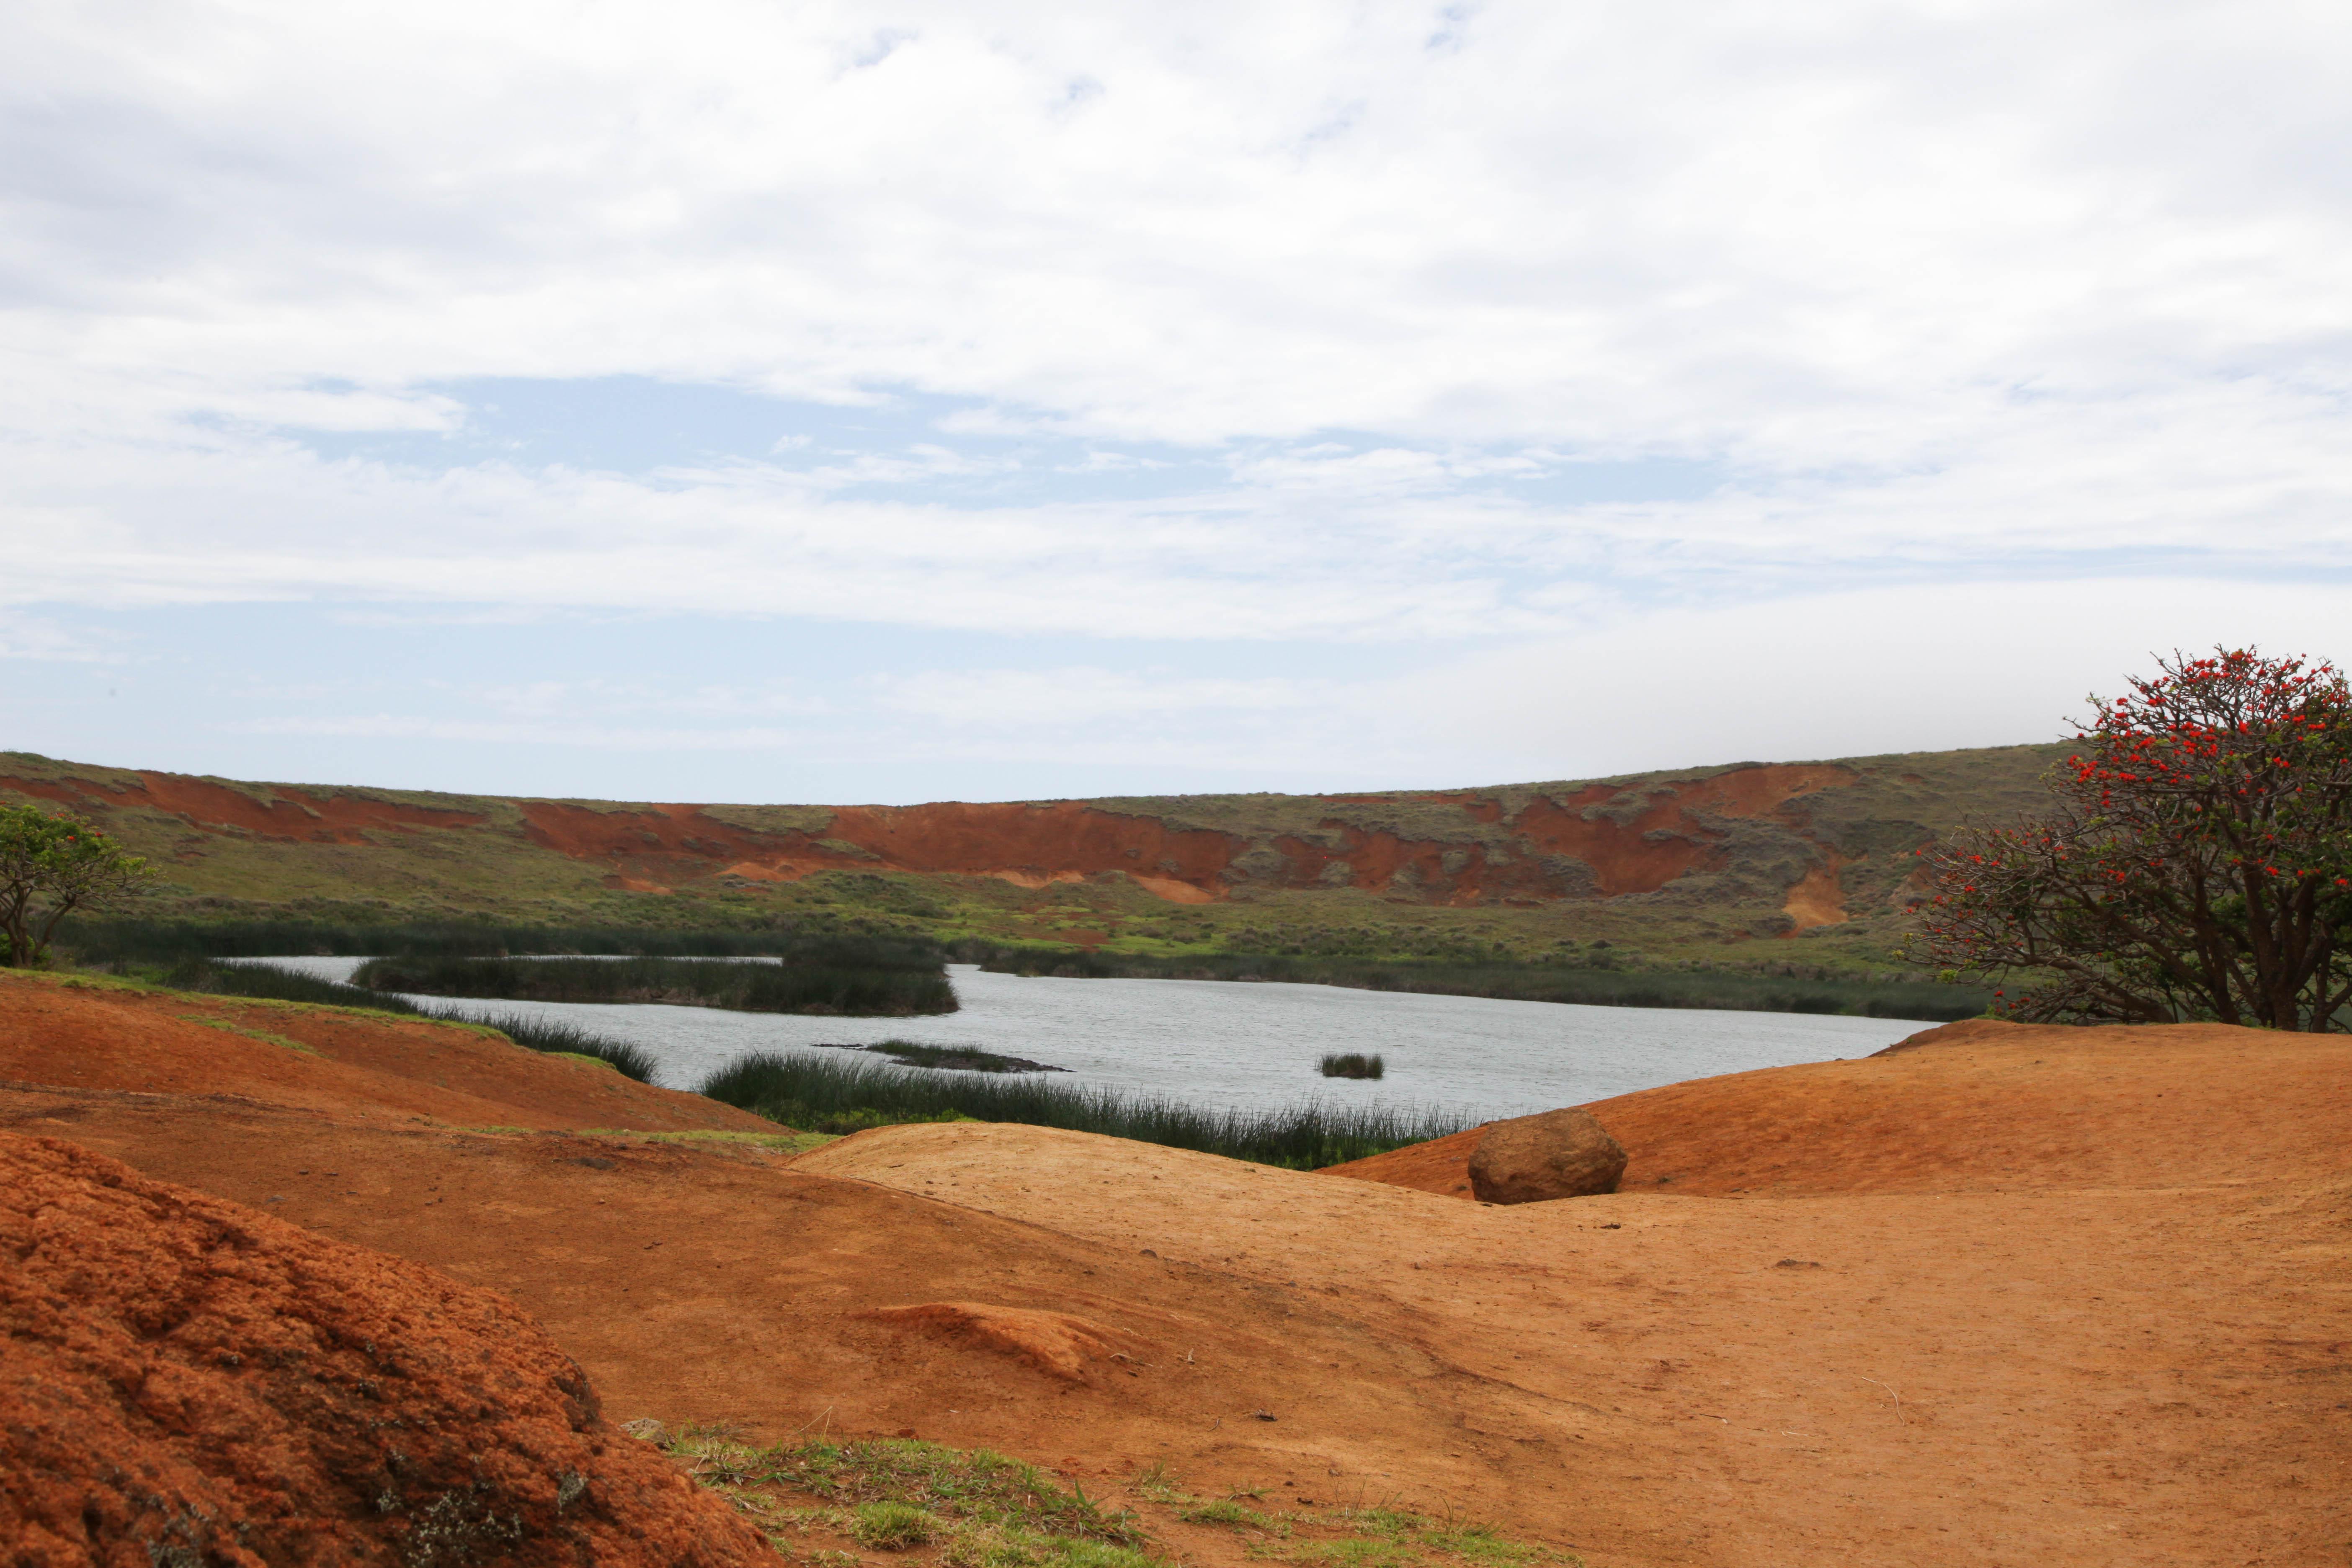 Lagoon in Rano Raraku crater